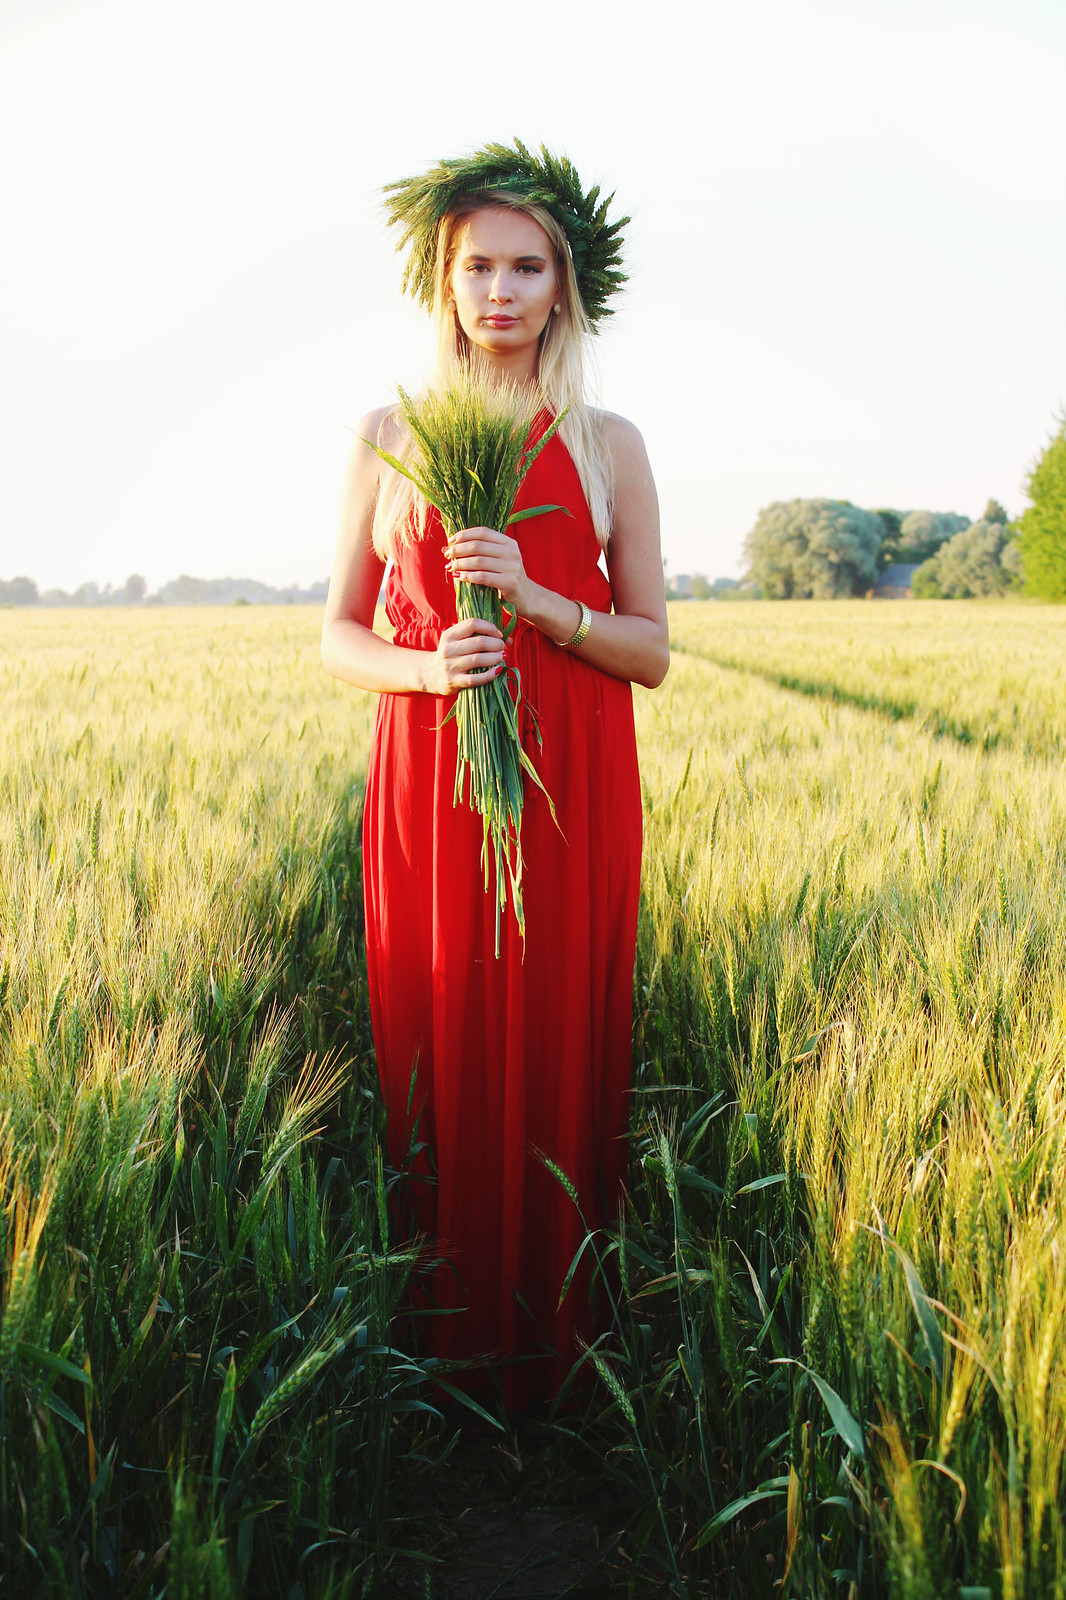 Latvian fashion and beauty blogger